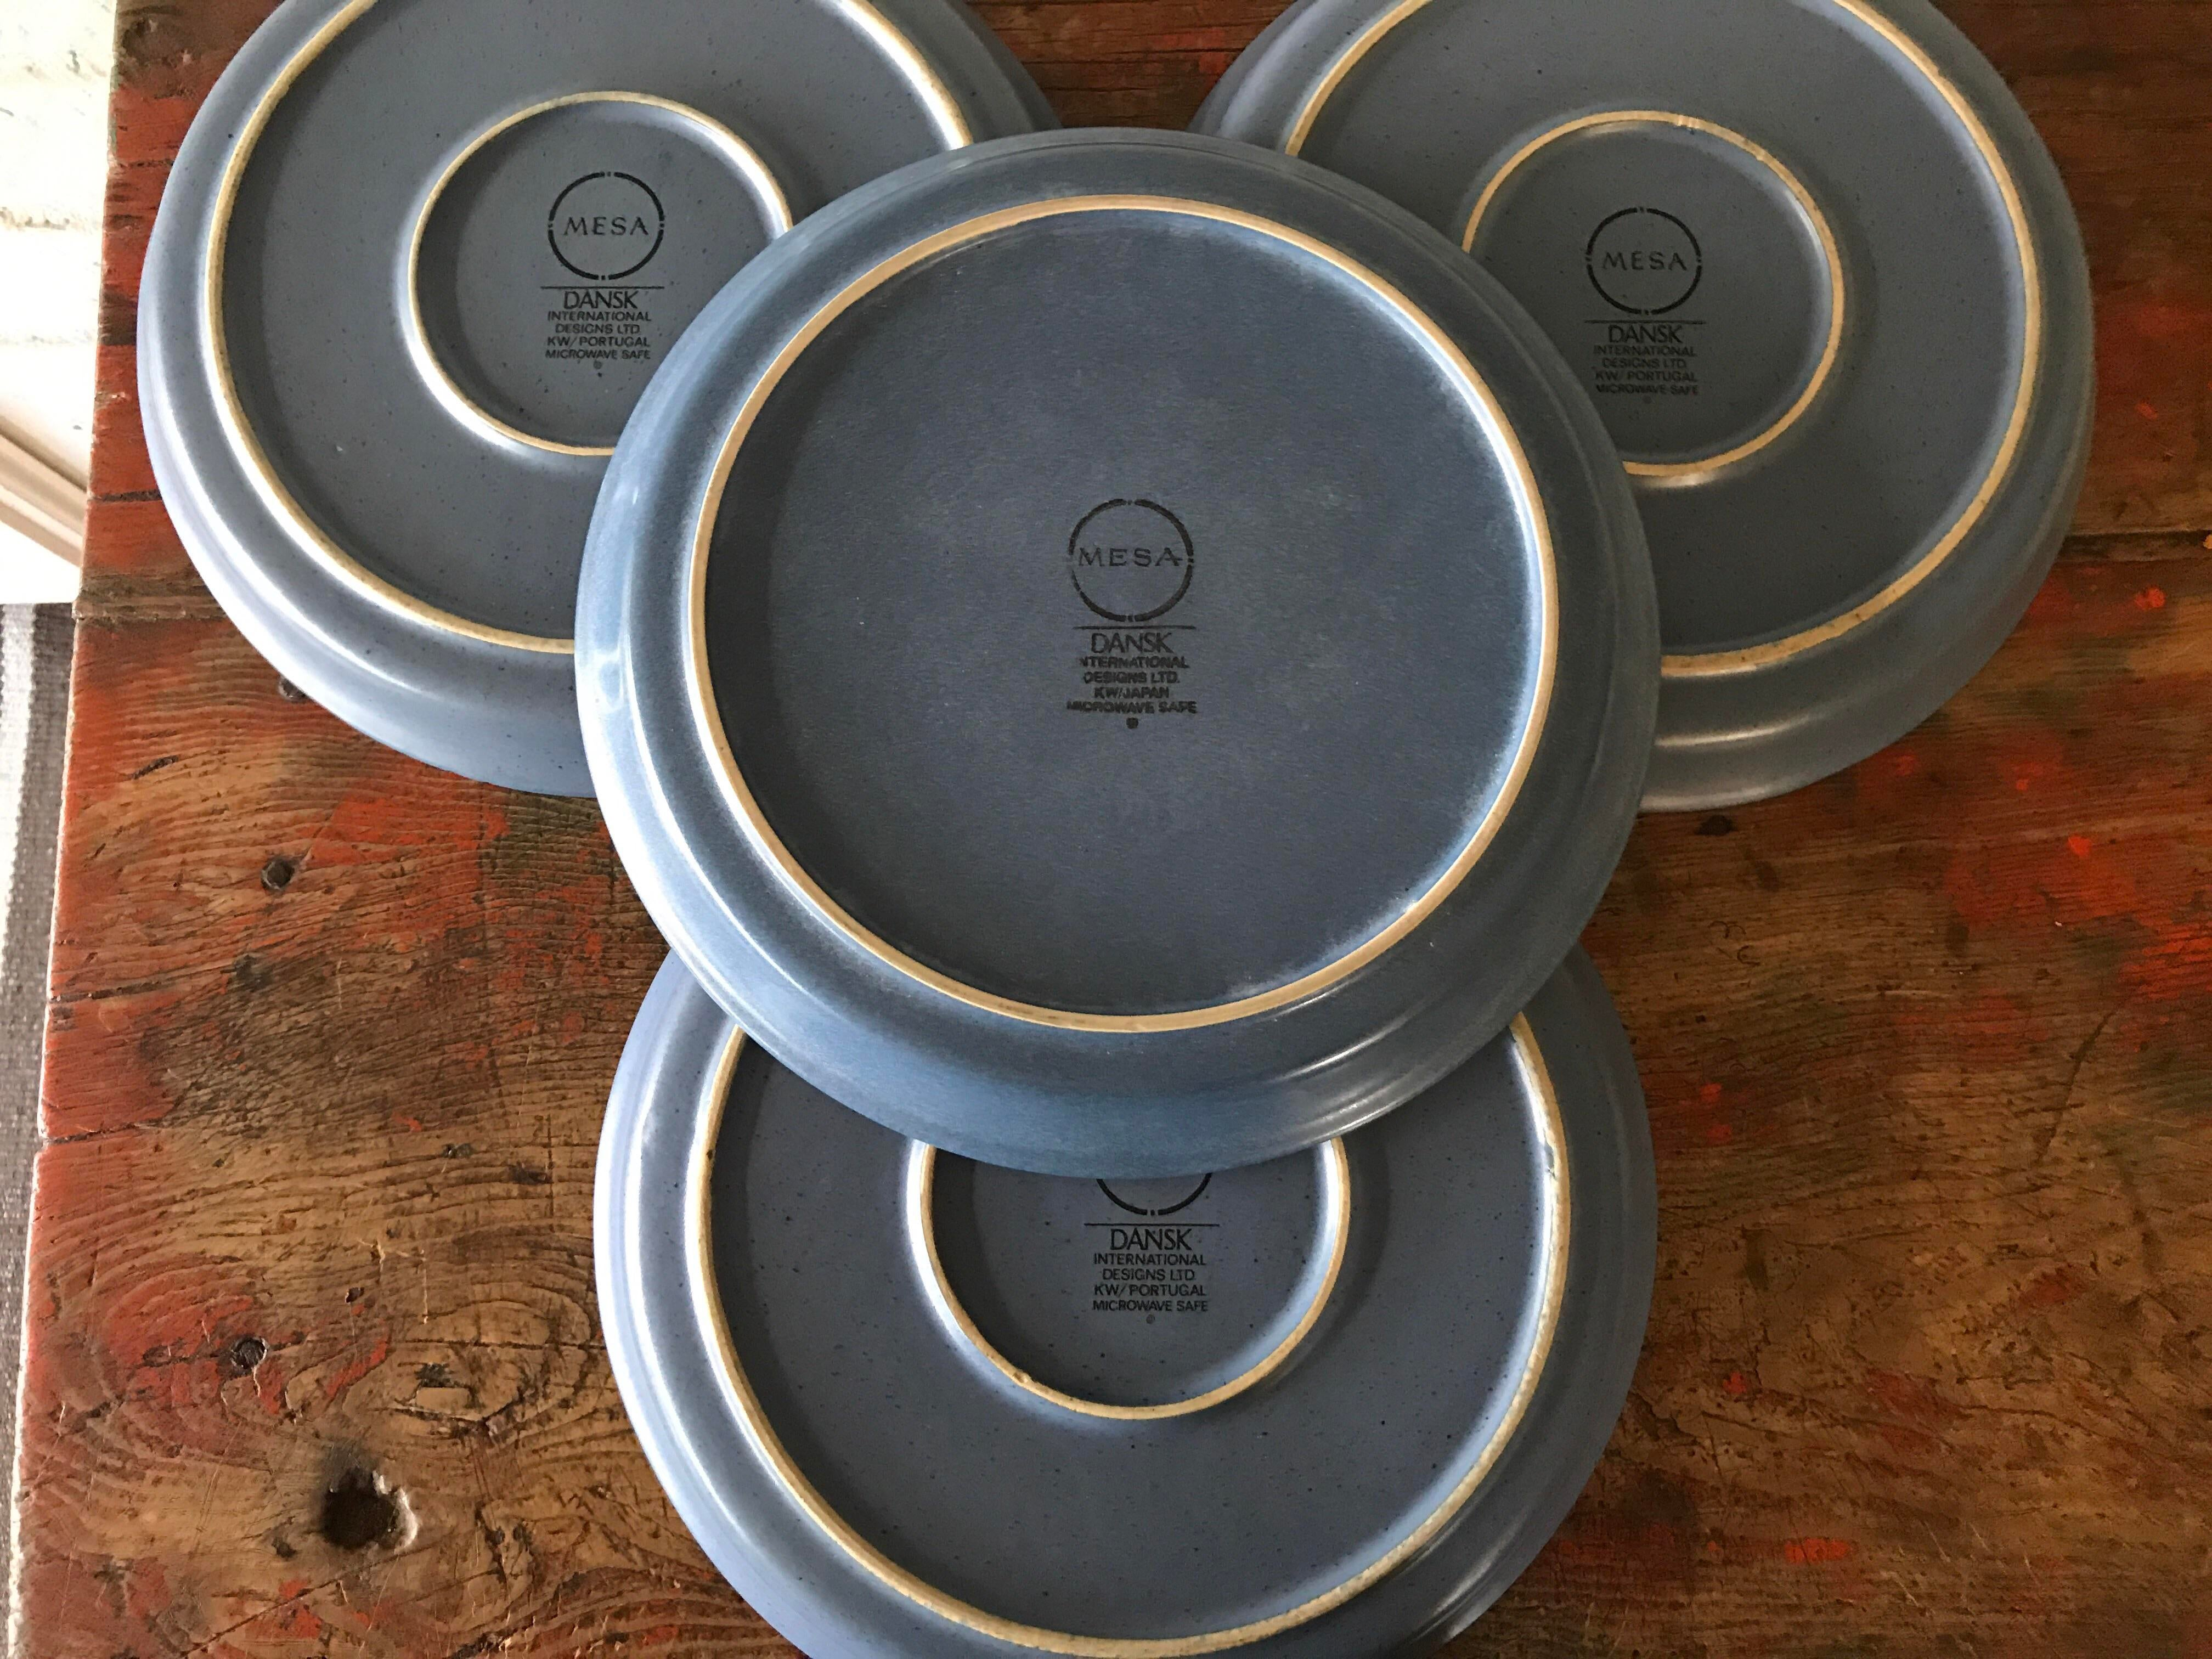 Dansk Mesa Blue Dinner Plates - Set of 4 - Image 4 of 7  sc 1 st  Chairish & Dansk Mesa Blue Dinner Plates - Set of 4   Chairish